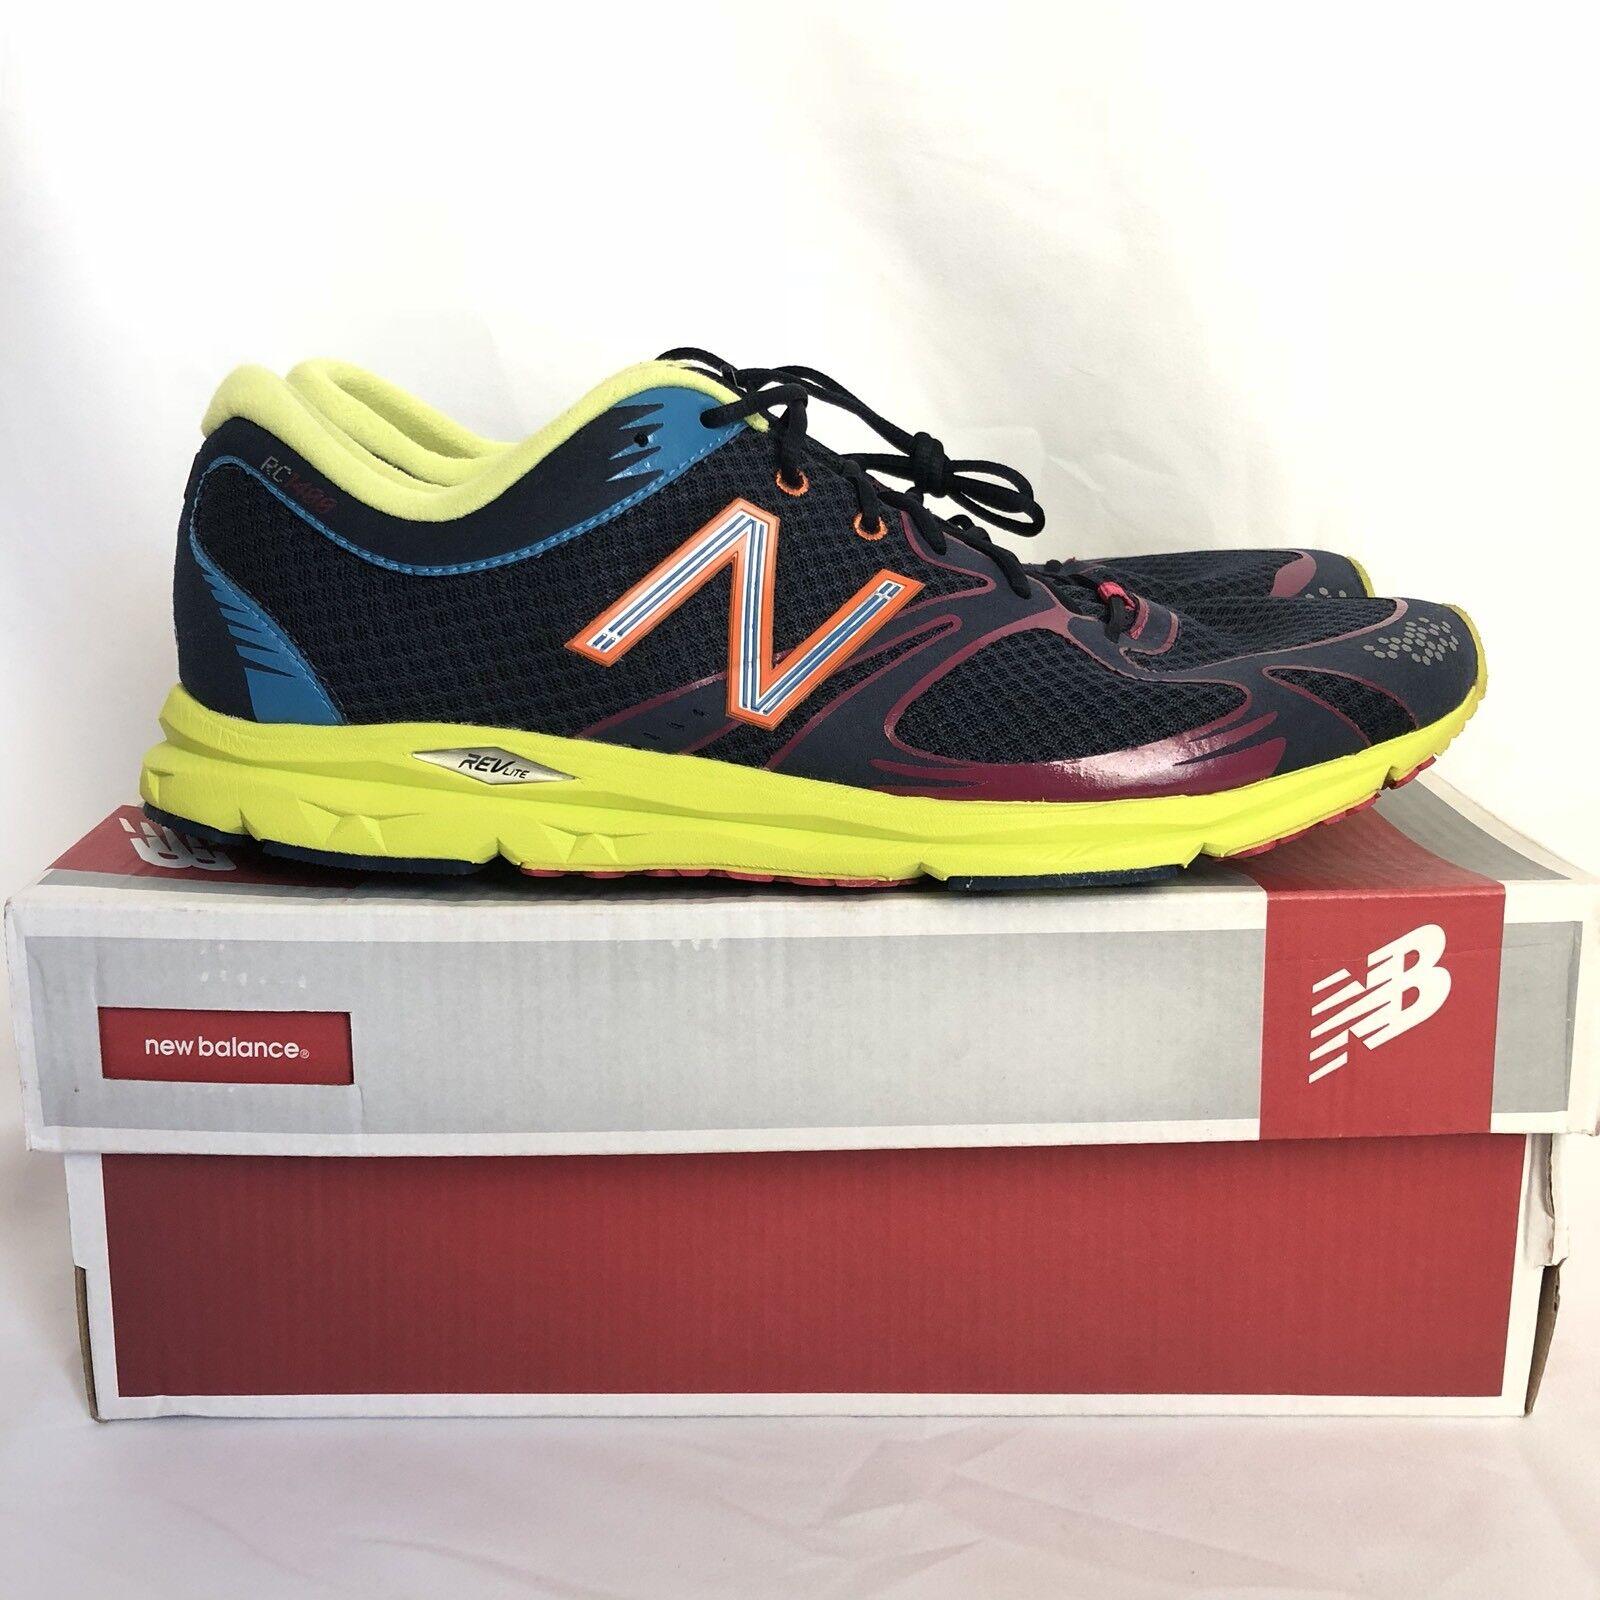 New Balance Balance Balance 1400 MR1400NY mens 12.5 athletic running shoes Navy Yellow 78df5f